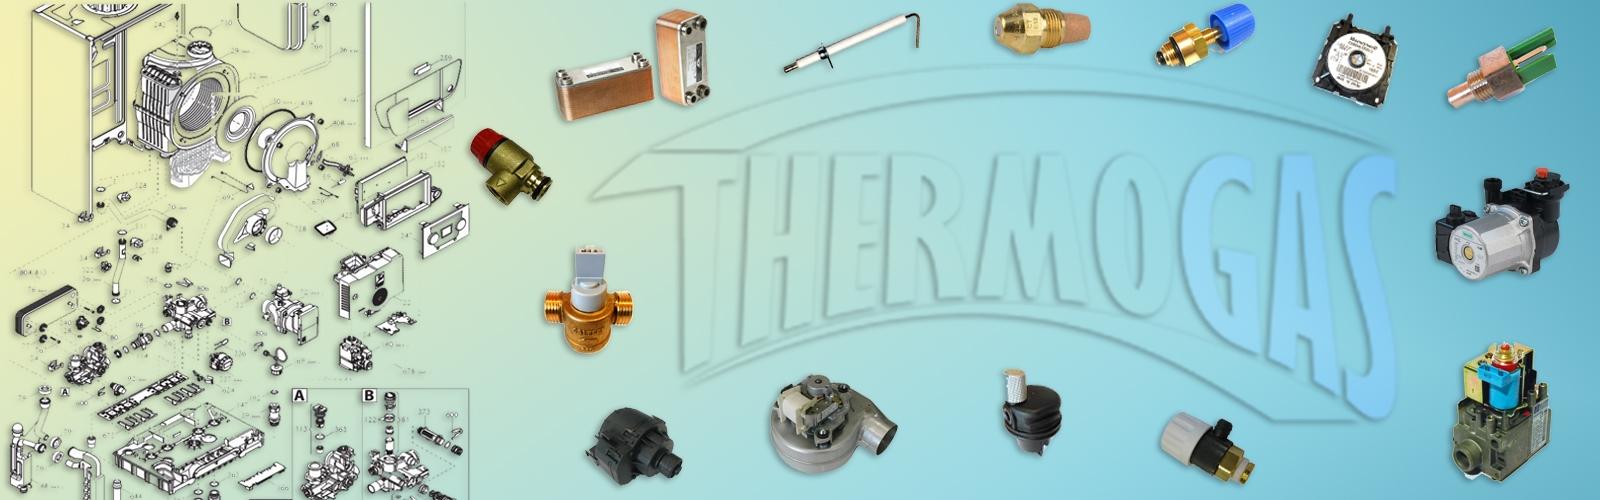 https://www.ricambicaldaieroma.it/prodotti/ricambi-ed-accessori-gas/caldaie.html